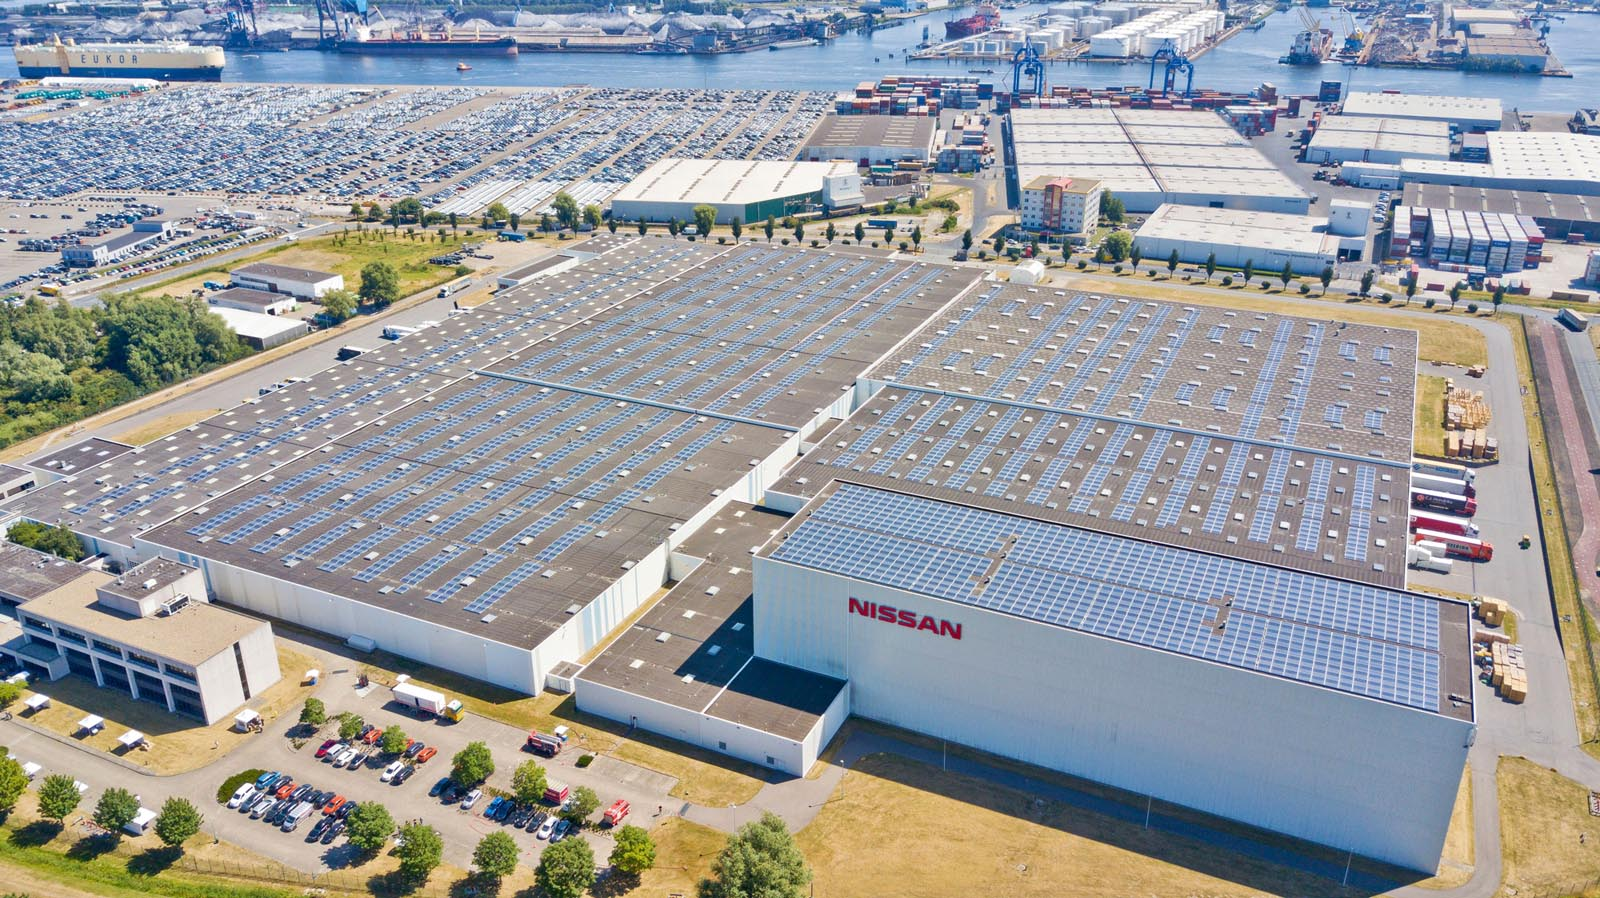 Photo of Η Nissan  θέτει σε λειτουργία μεγαλύτερη οροφή με συλλέκτες ηλιακής ενέργειας στην Ολλανδία.